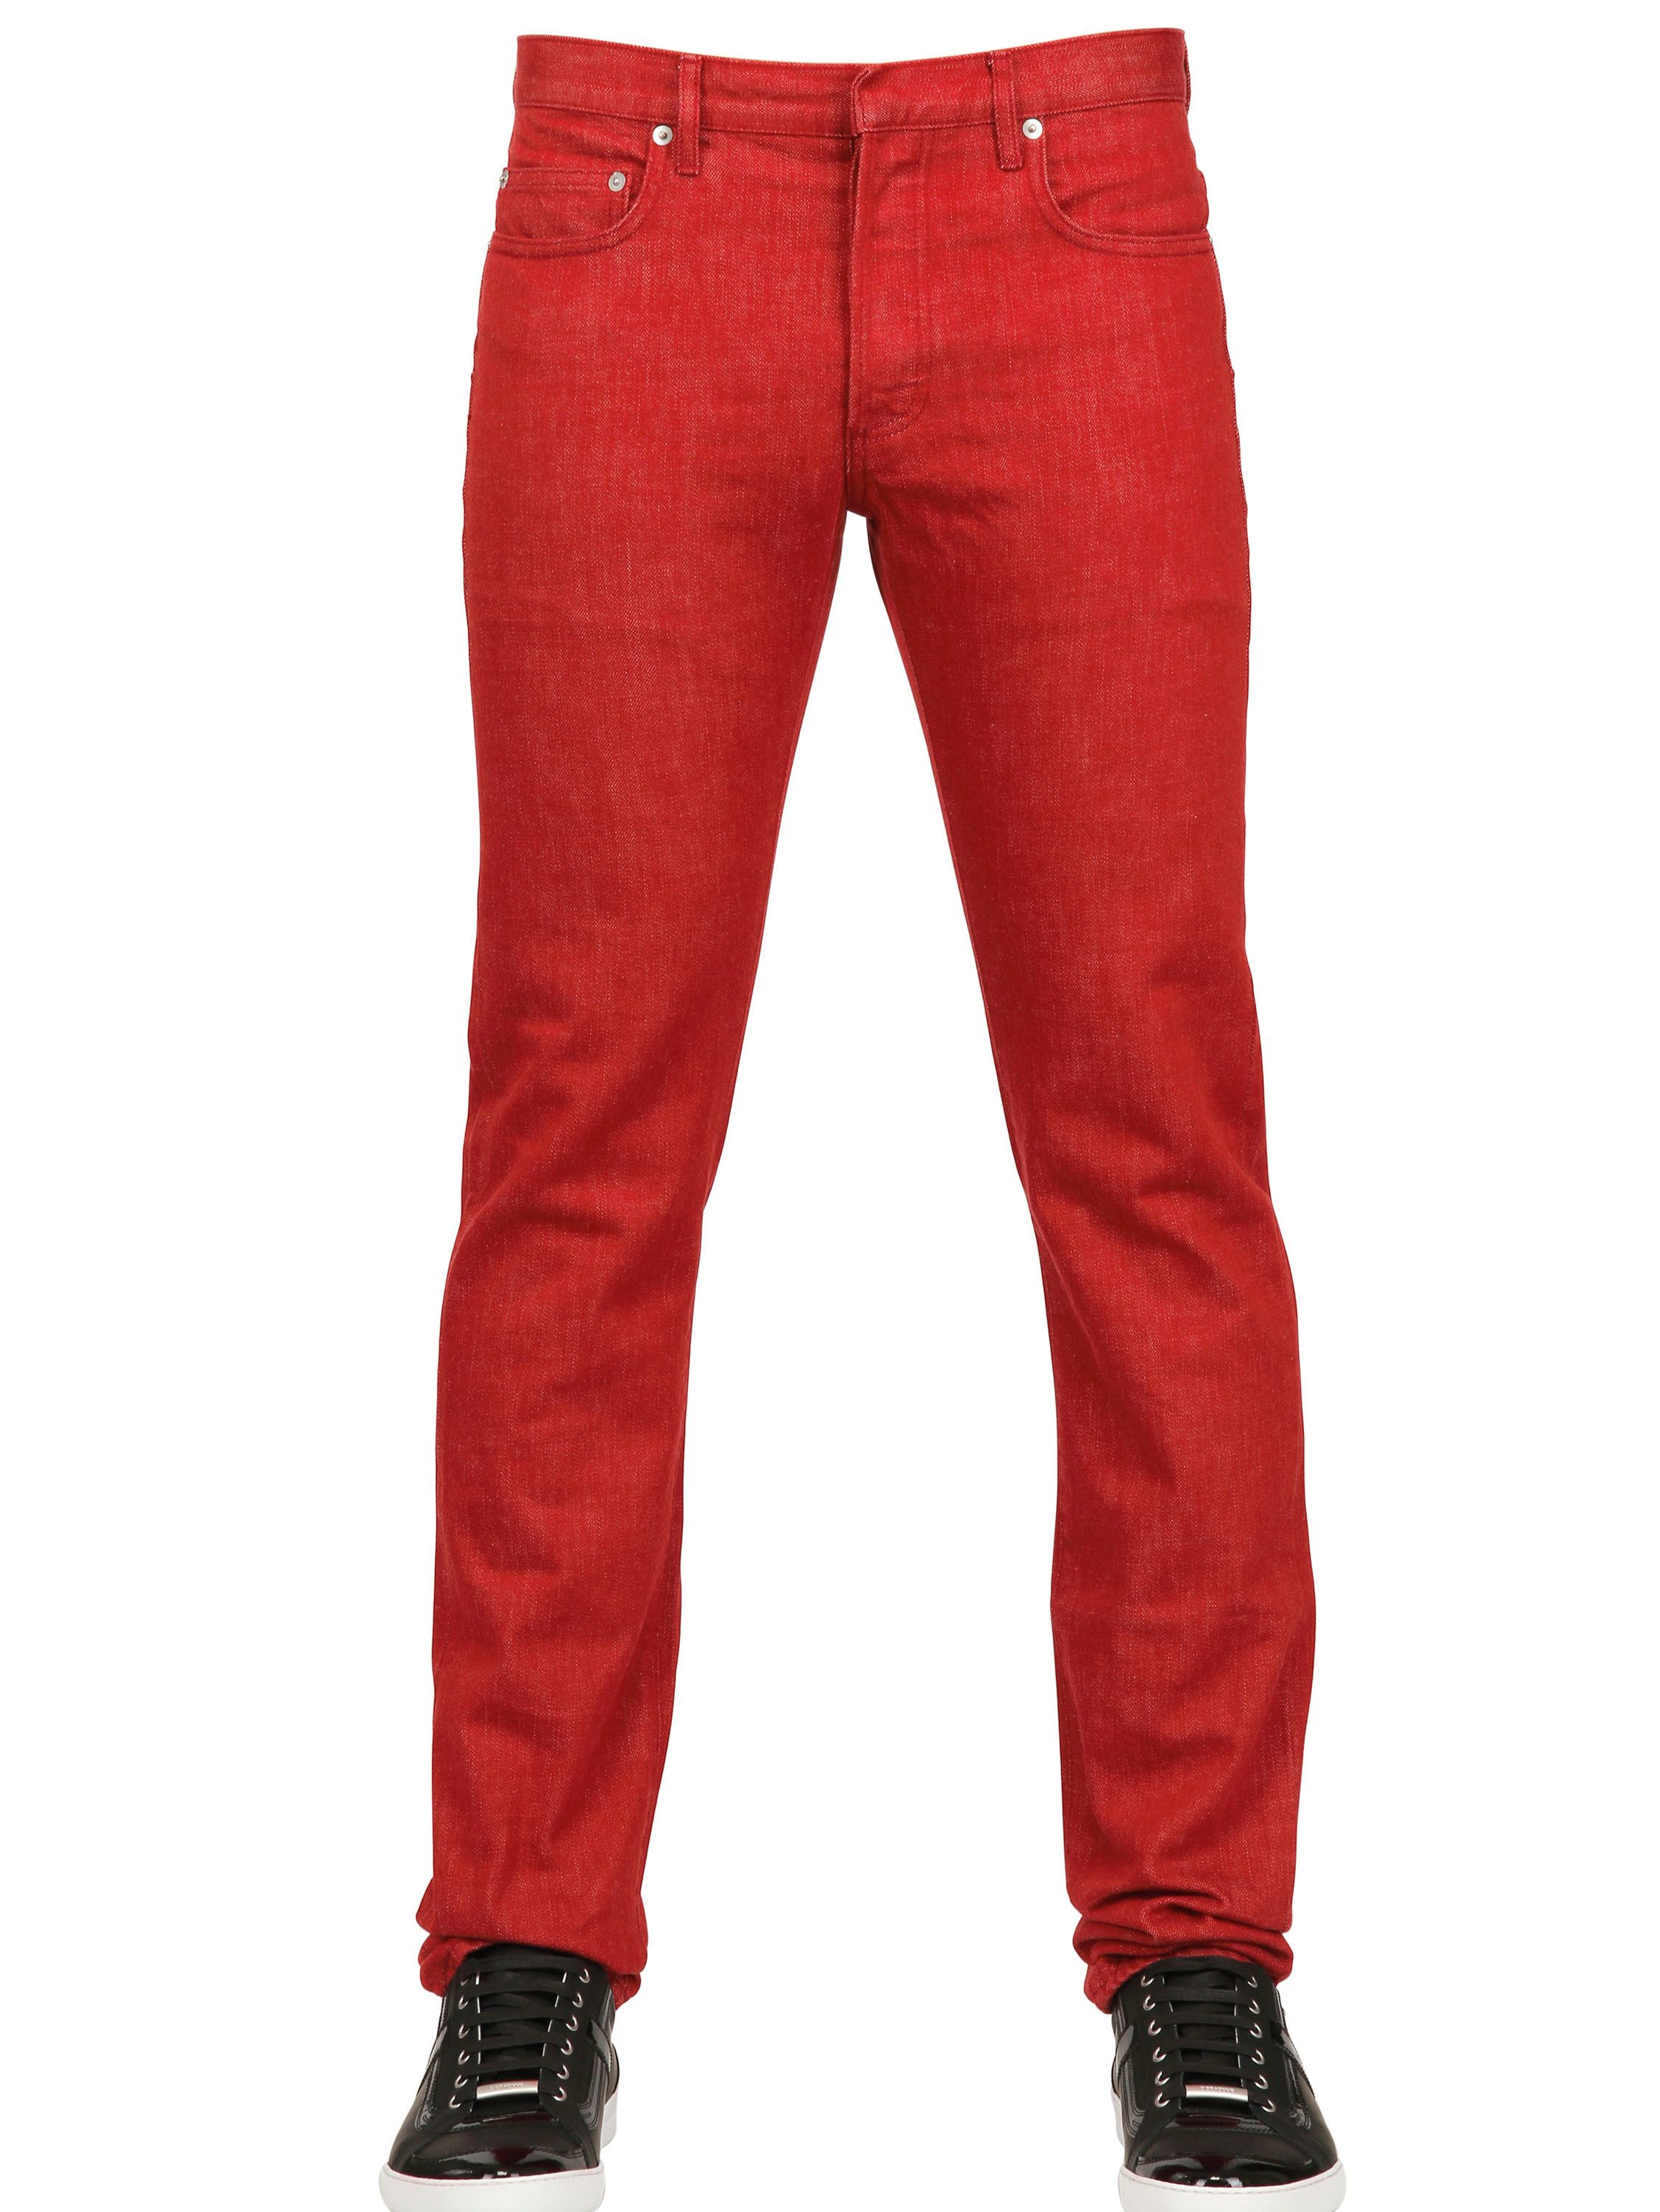 Dior Homme Jeans | Men's Skinny, Bootcut & Slim Jeans | Lyst